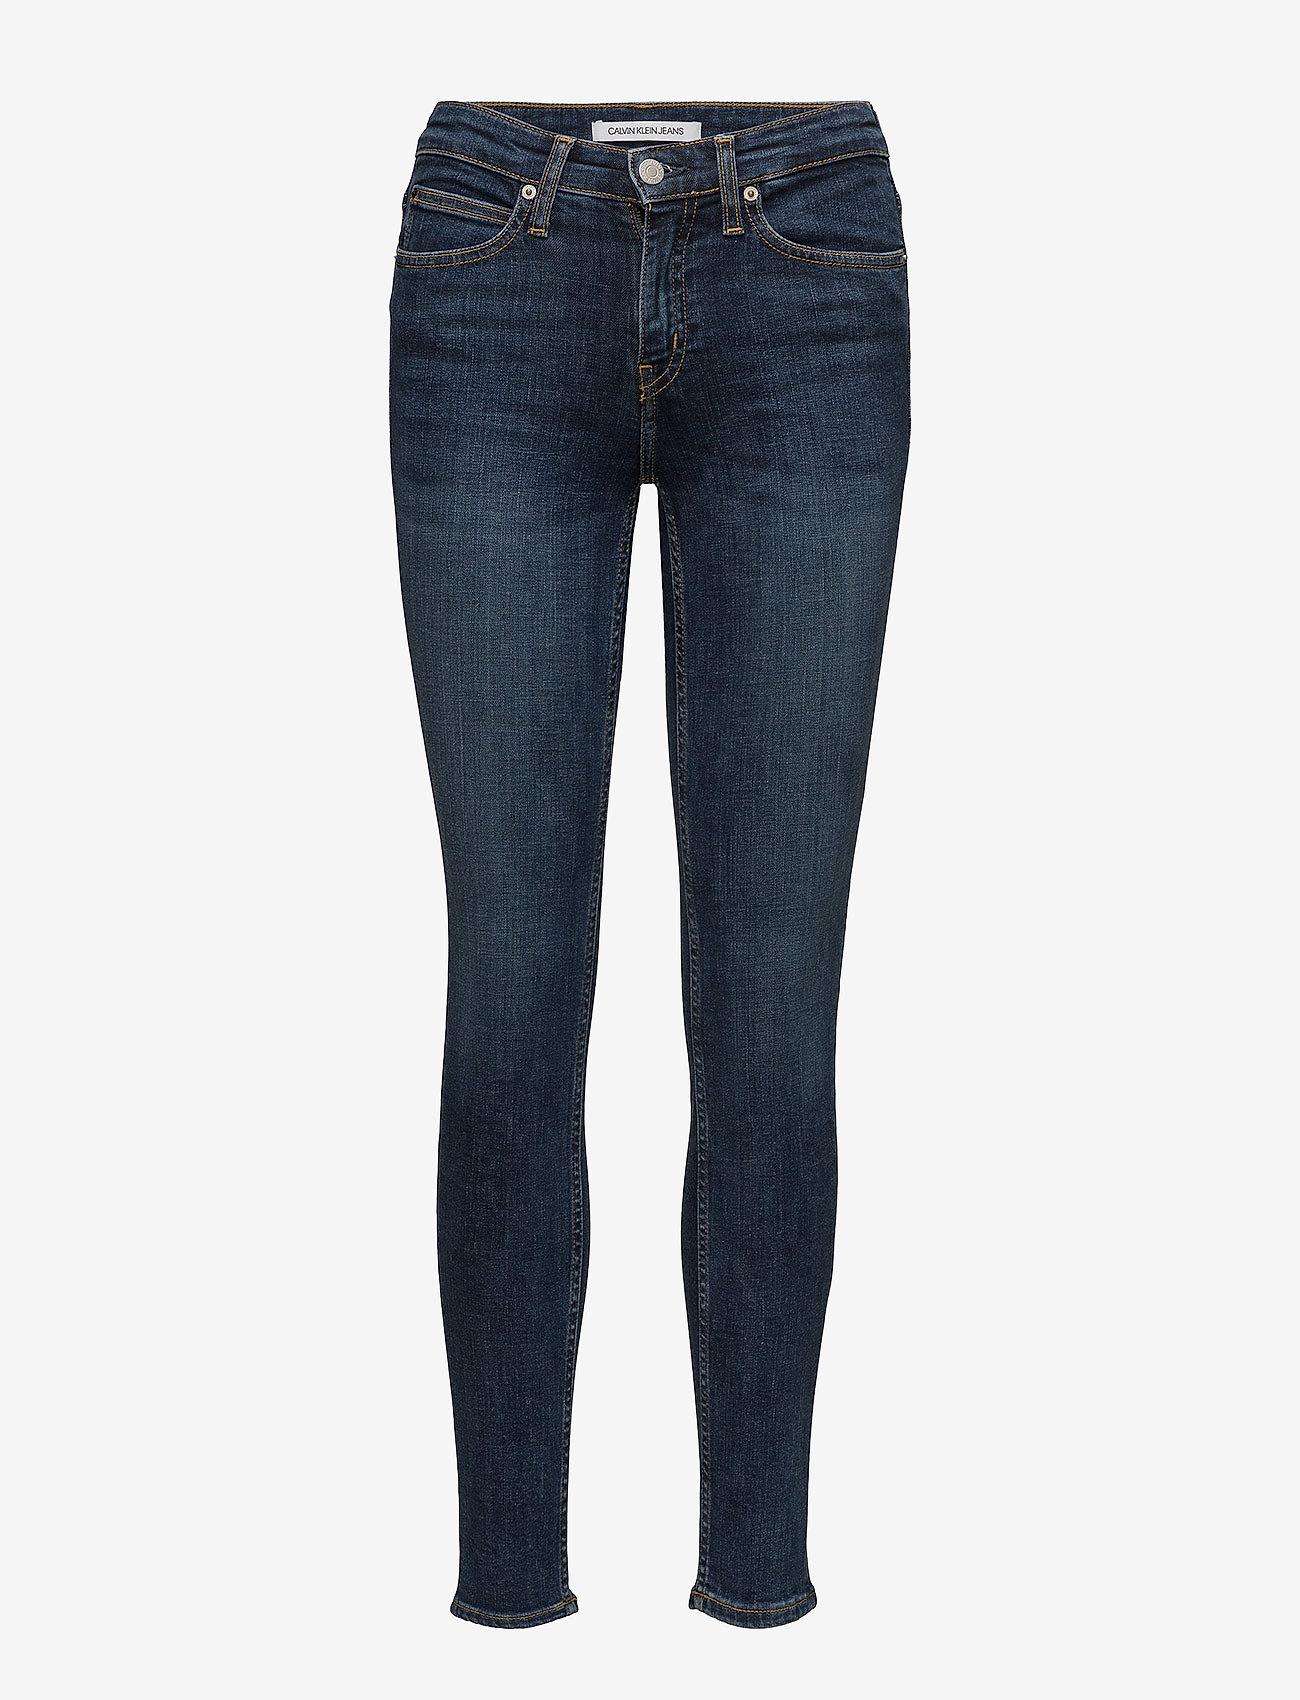 Calvin Klein Jeans - CKJ 011 MID RISE SKI - amsterdam blue mid